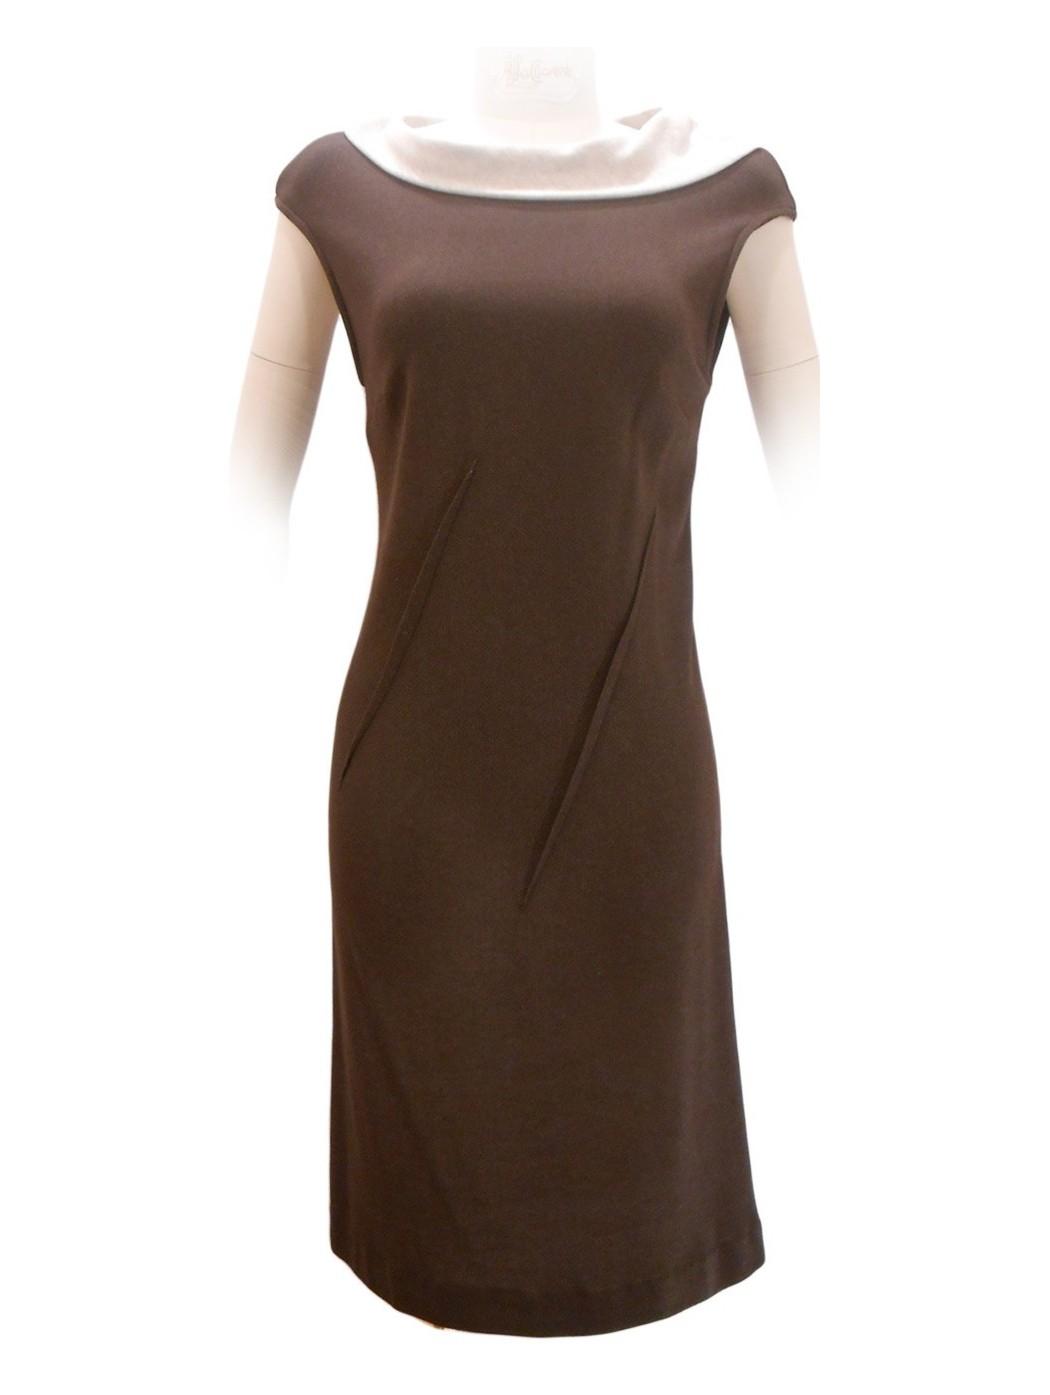 Two-coloured sheath dress